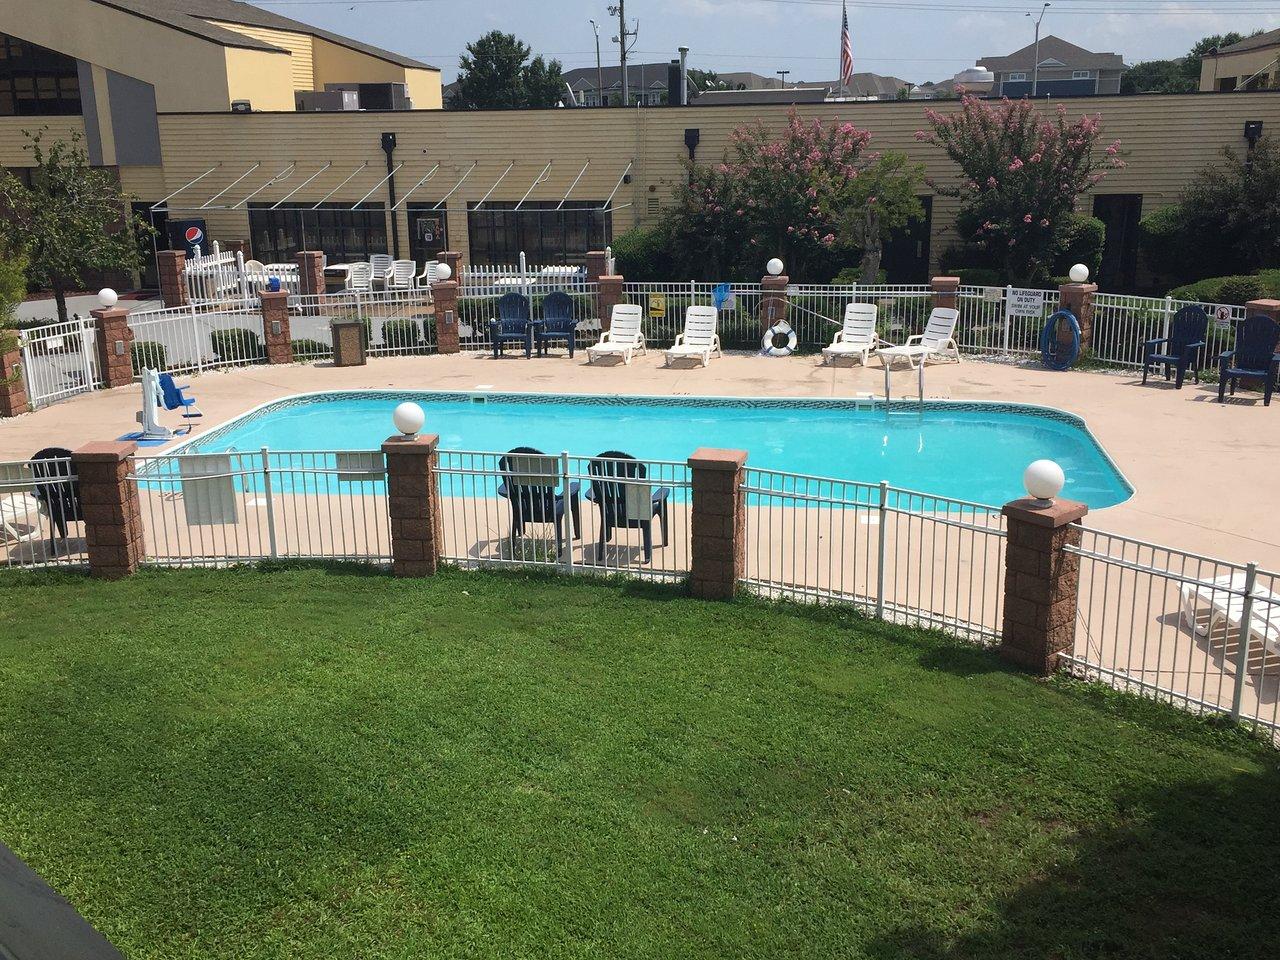 magnuson hotel virginia beach 52 6 4 prices motel reviews rh tripadvisor com